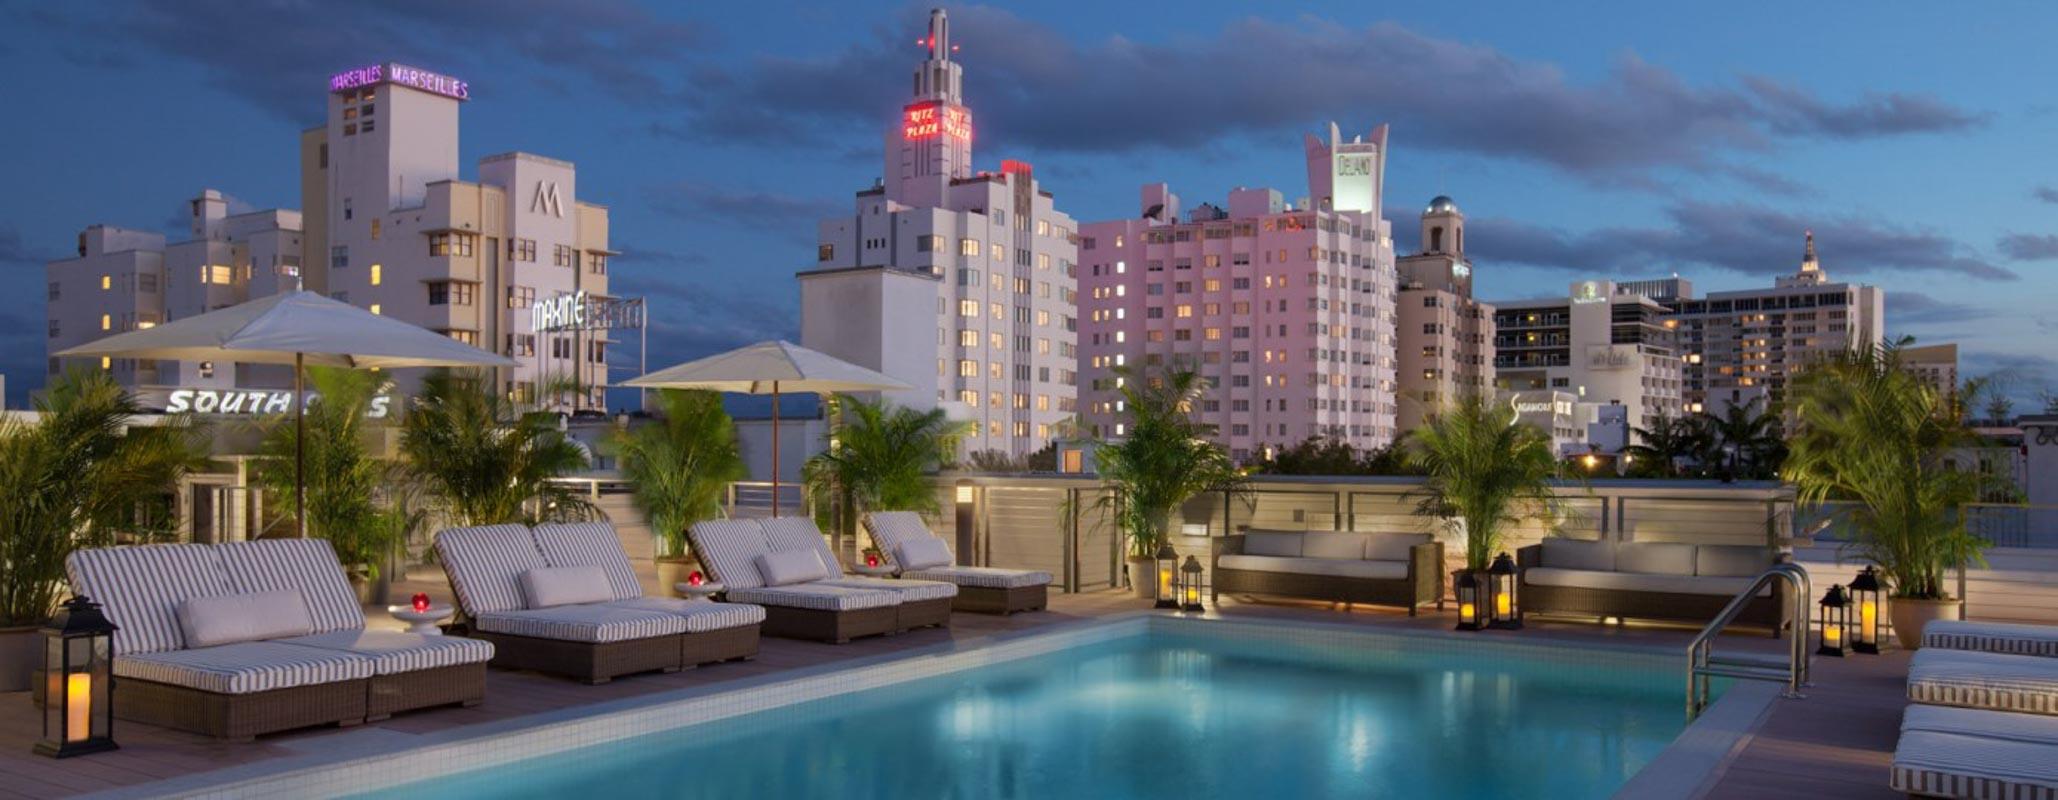 Orlando Rooftop Pools & Rooftop Pool Oasis At Four Seasons